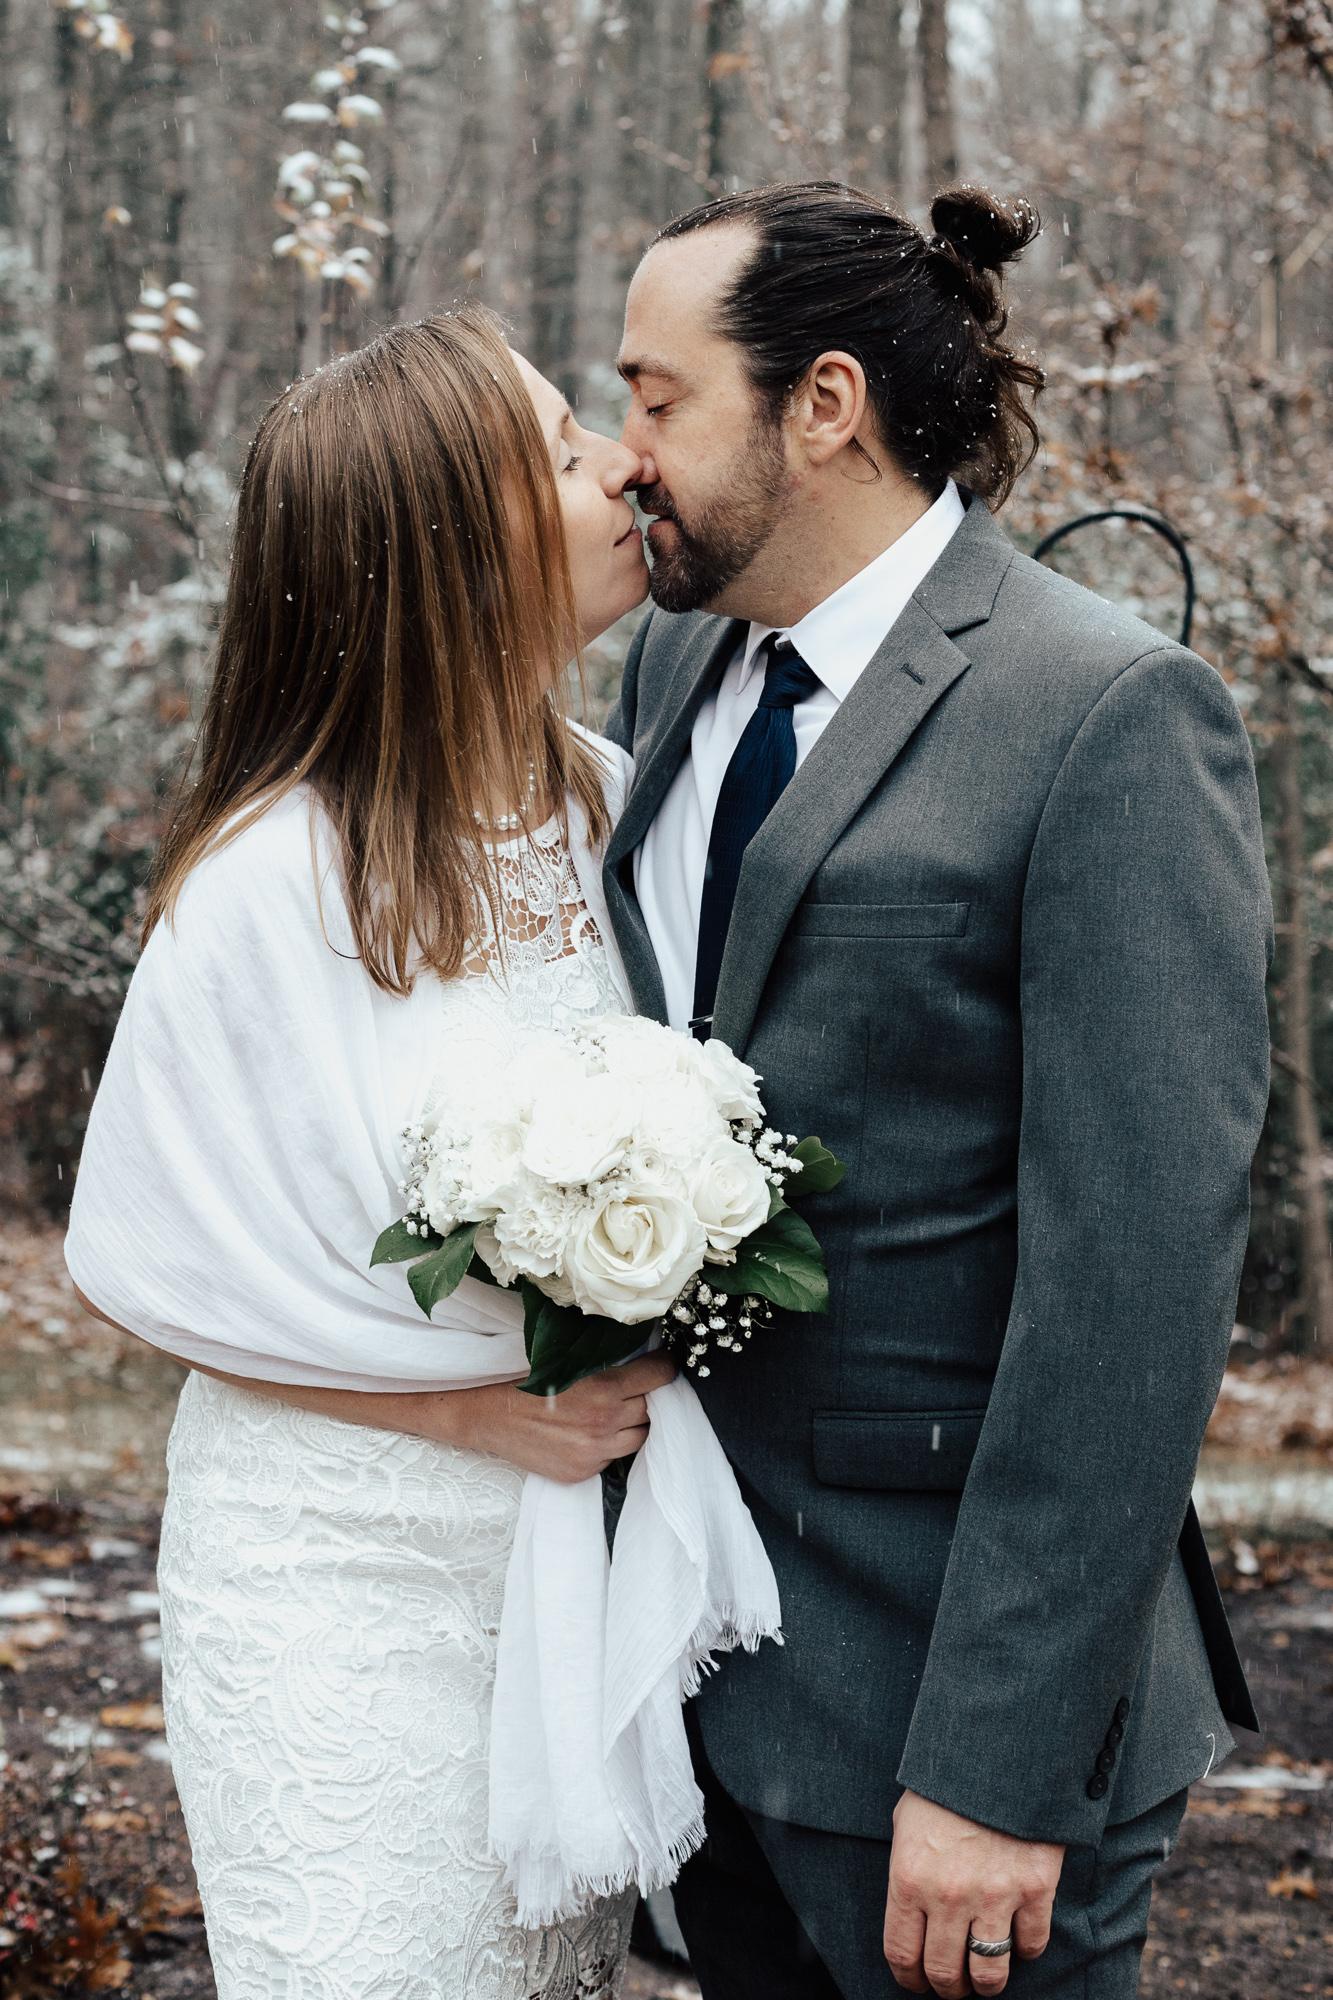 Jason & Katie | Married-083.jpg